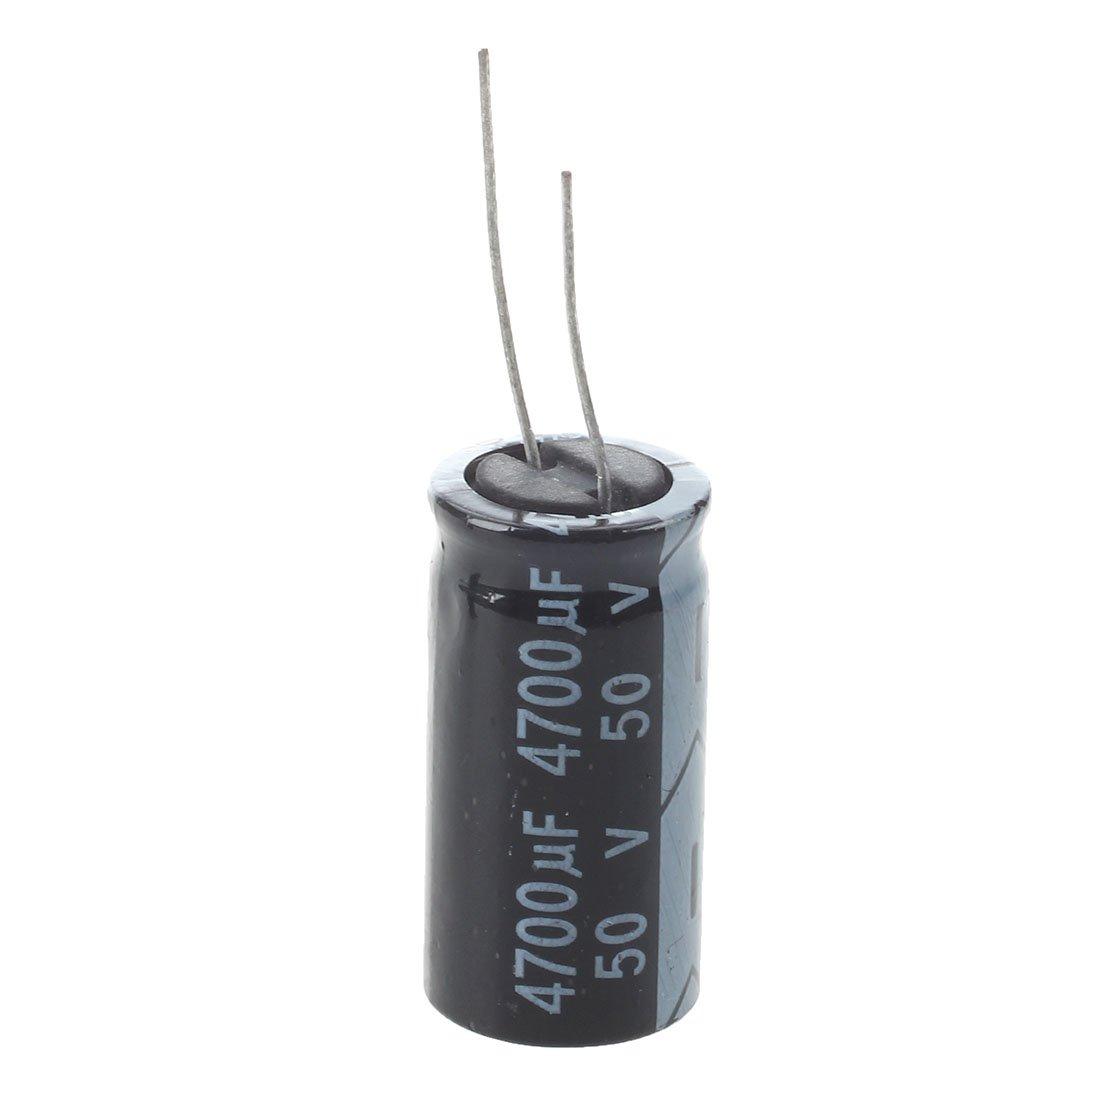 REFURBISHHOUSE 5 Stk 50V 4700uF Radial Leiter Aluminium elektrolytischen Kondensatoren